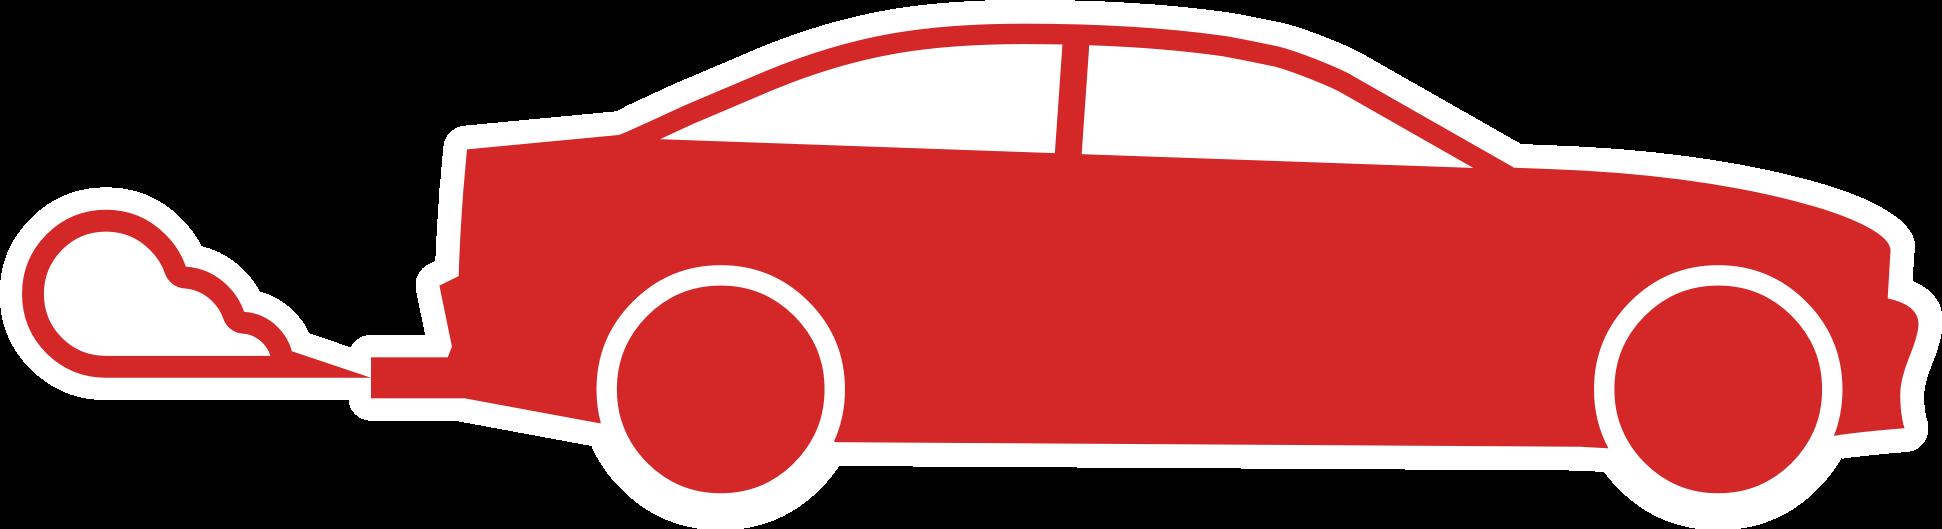 Car co2 clipart clip art free download Clipart - The Car Pollute the Air with CO2 clip art free download